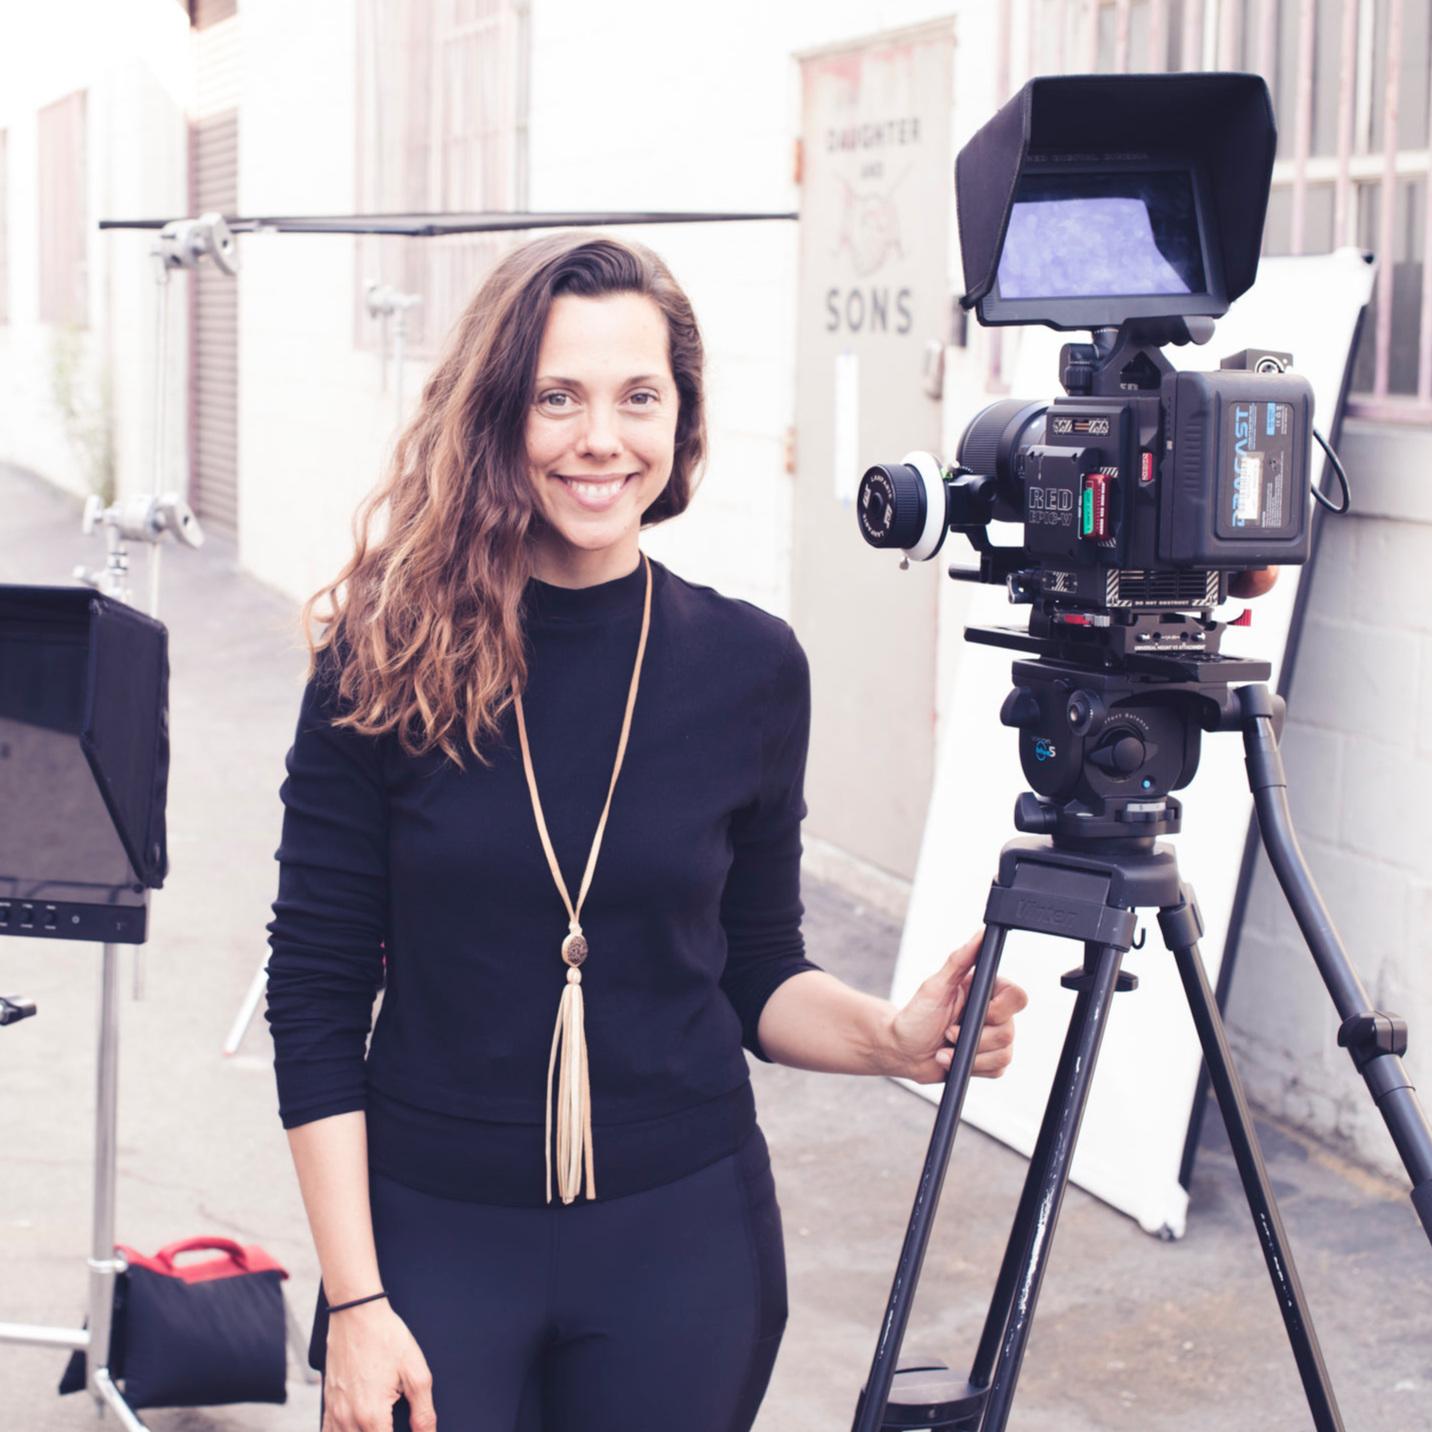 Jana Cruder    Owner  - Director, Photographer, Artist   @janacruder